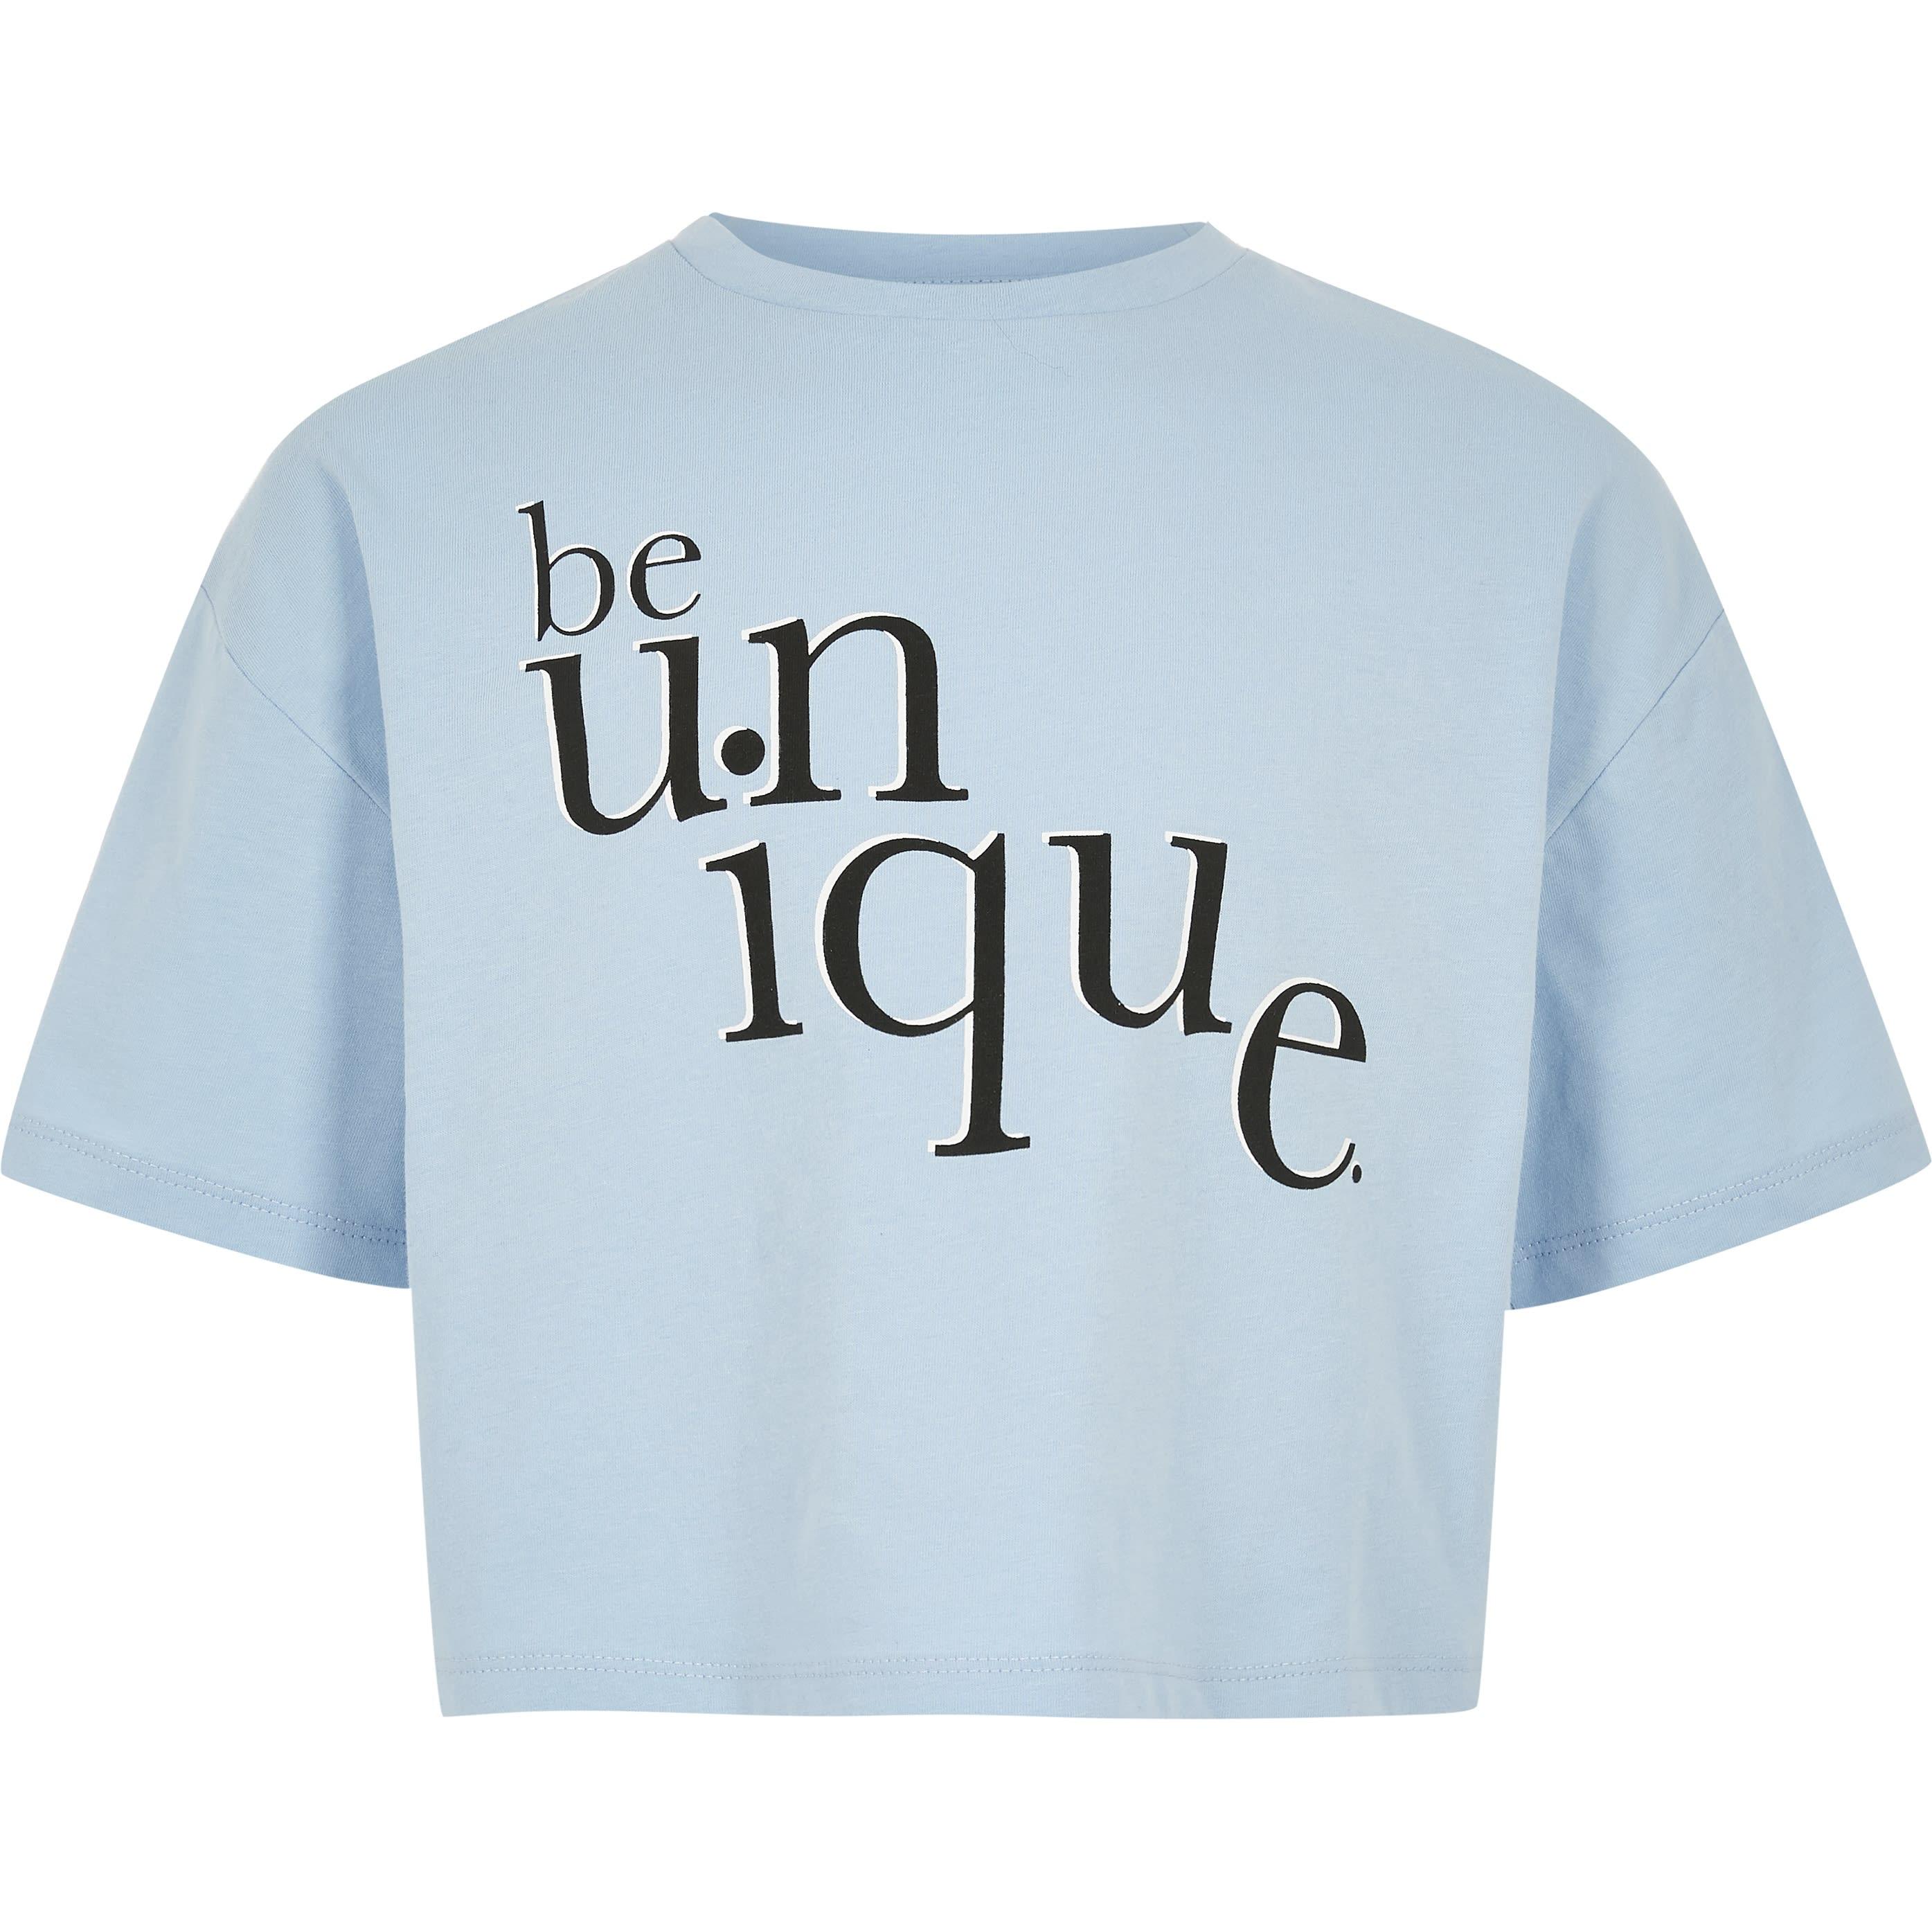 River Island Girls Blue 'Be unique' T-shirt (7-8 Yrs)